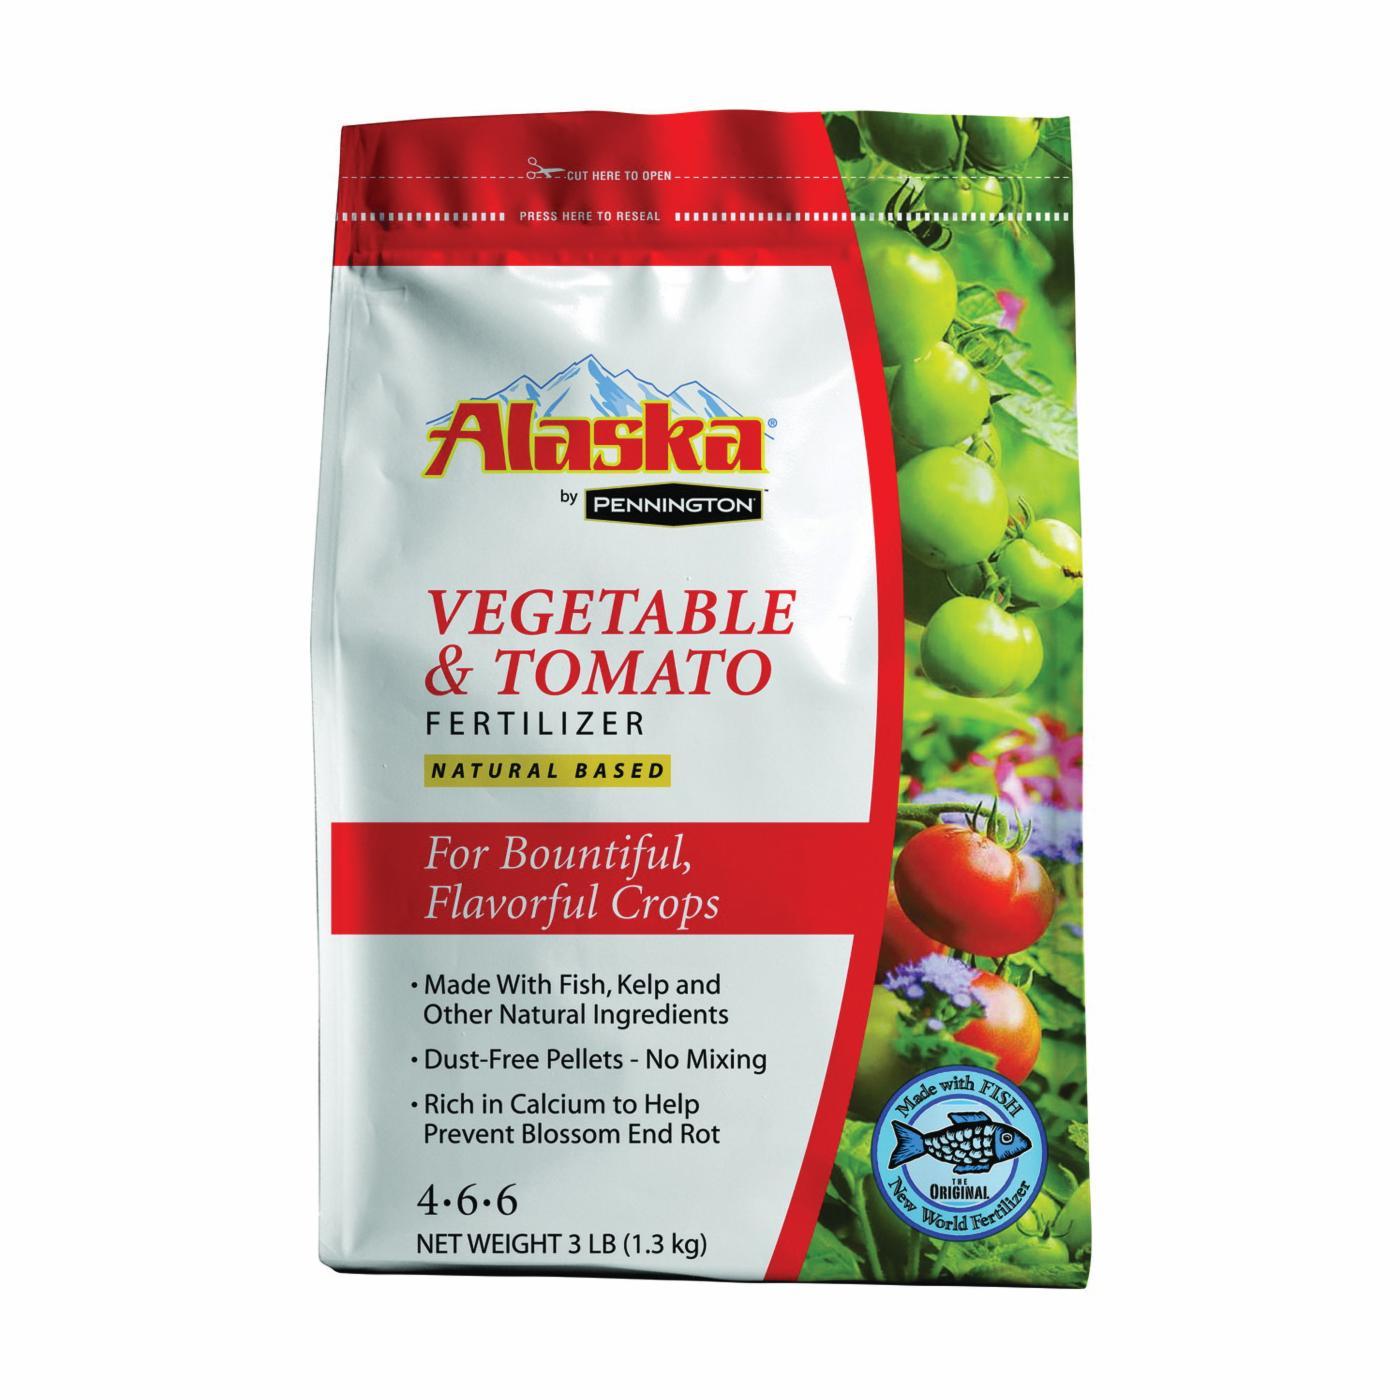 Alaska 100504561